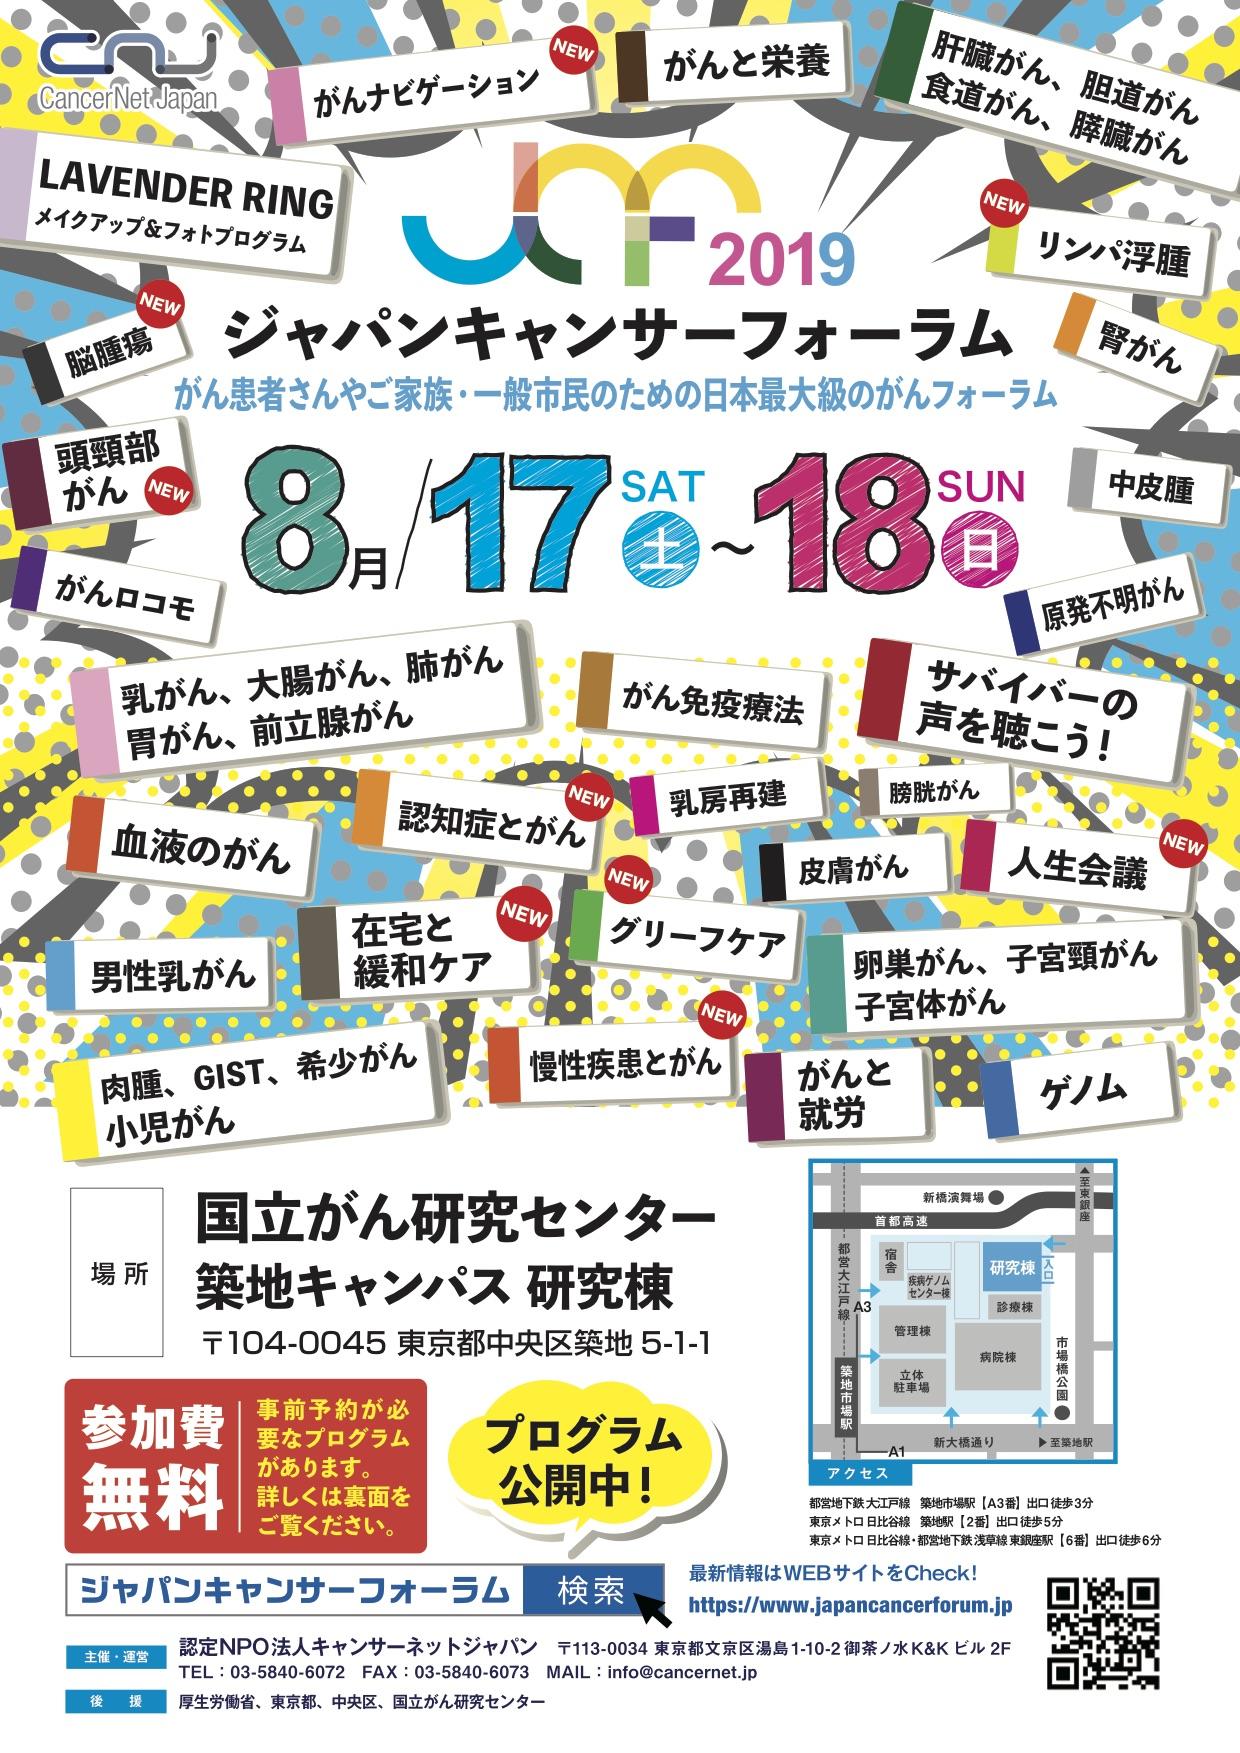 8/17・8/18 Japan Cancer Forum 2019開催のお知らせ